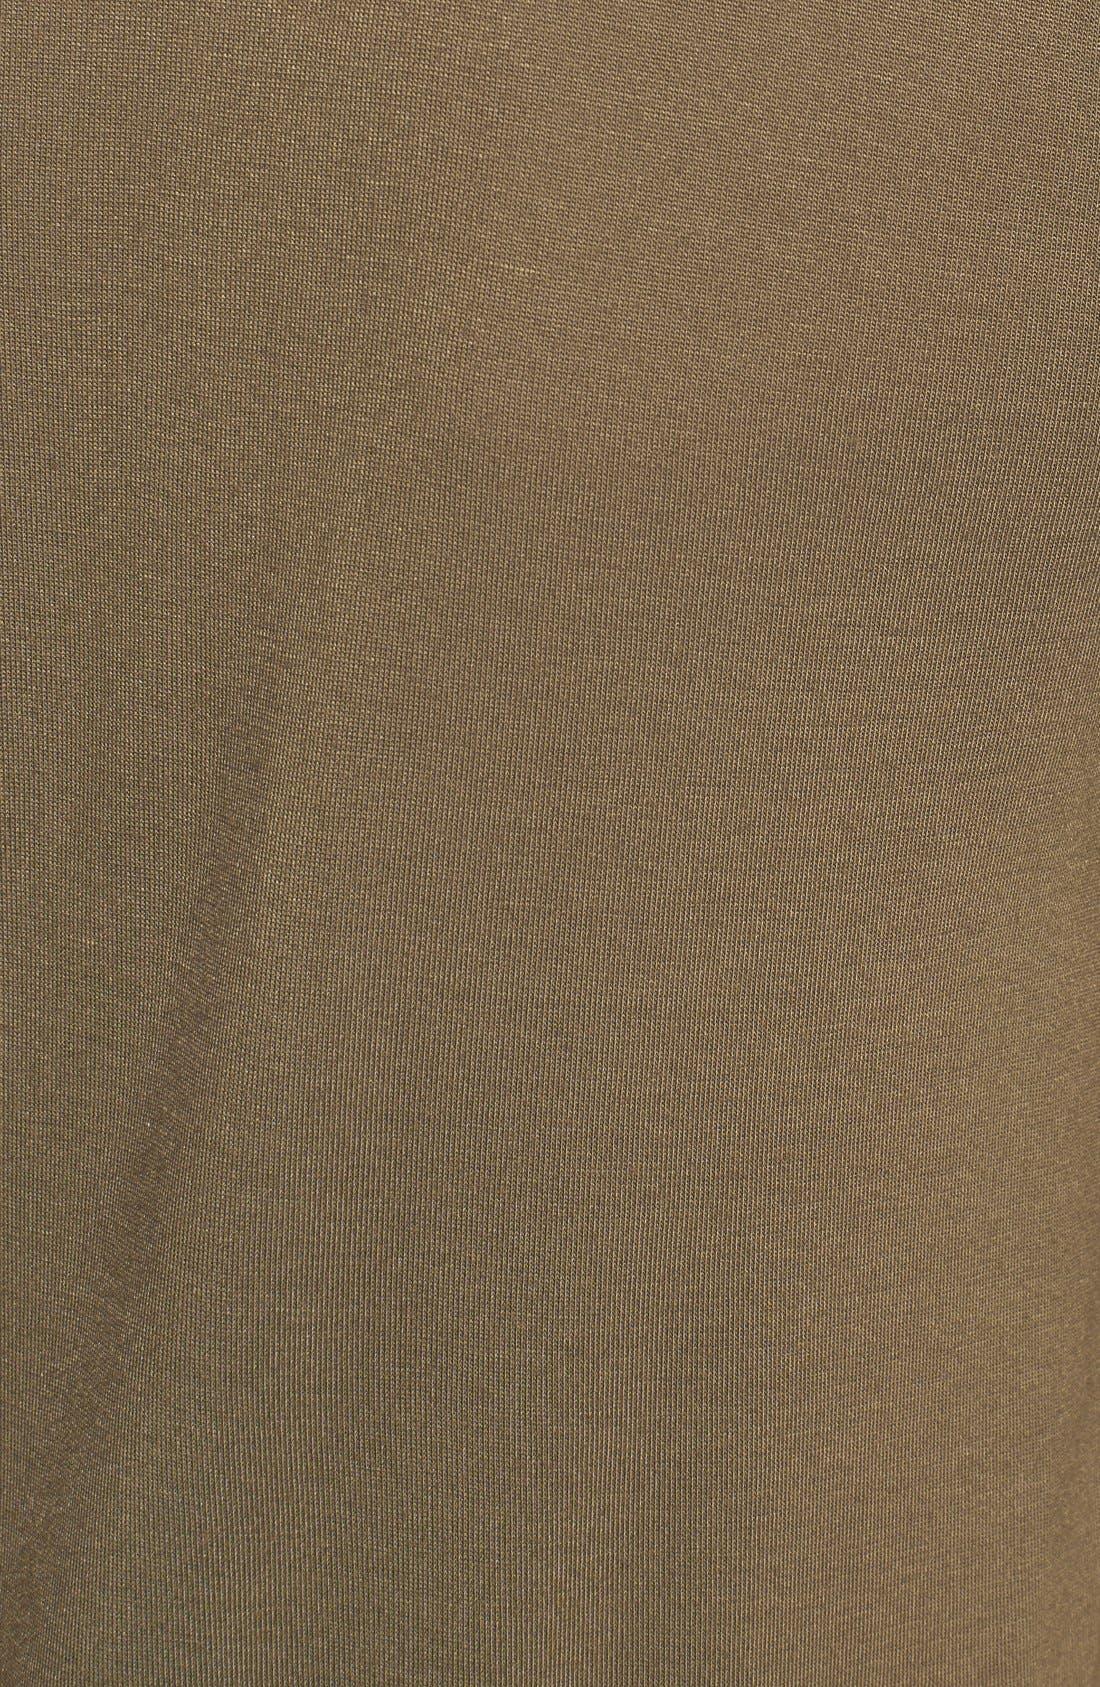 Alternate Image 3  - MICHAEL Michael Kors Camo Print Mixed Media Tee (Petite)